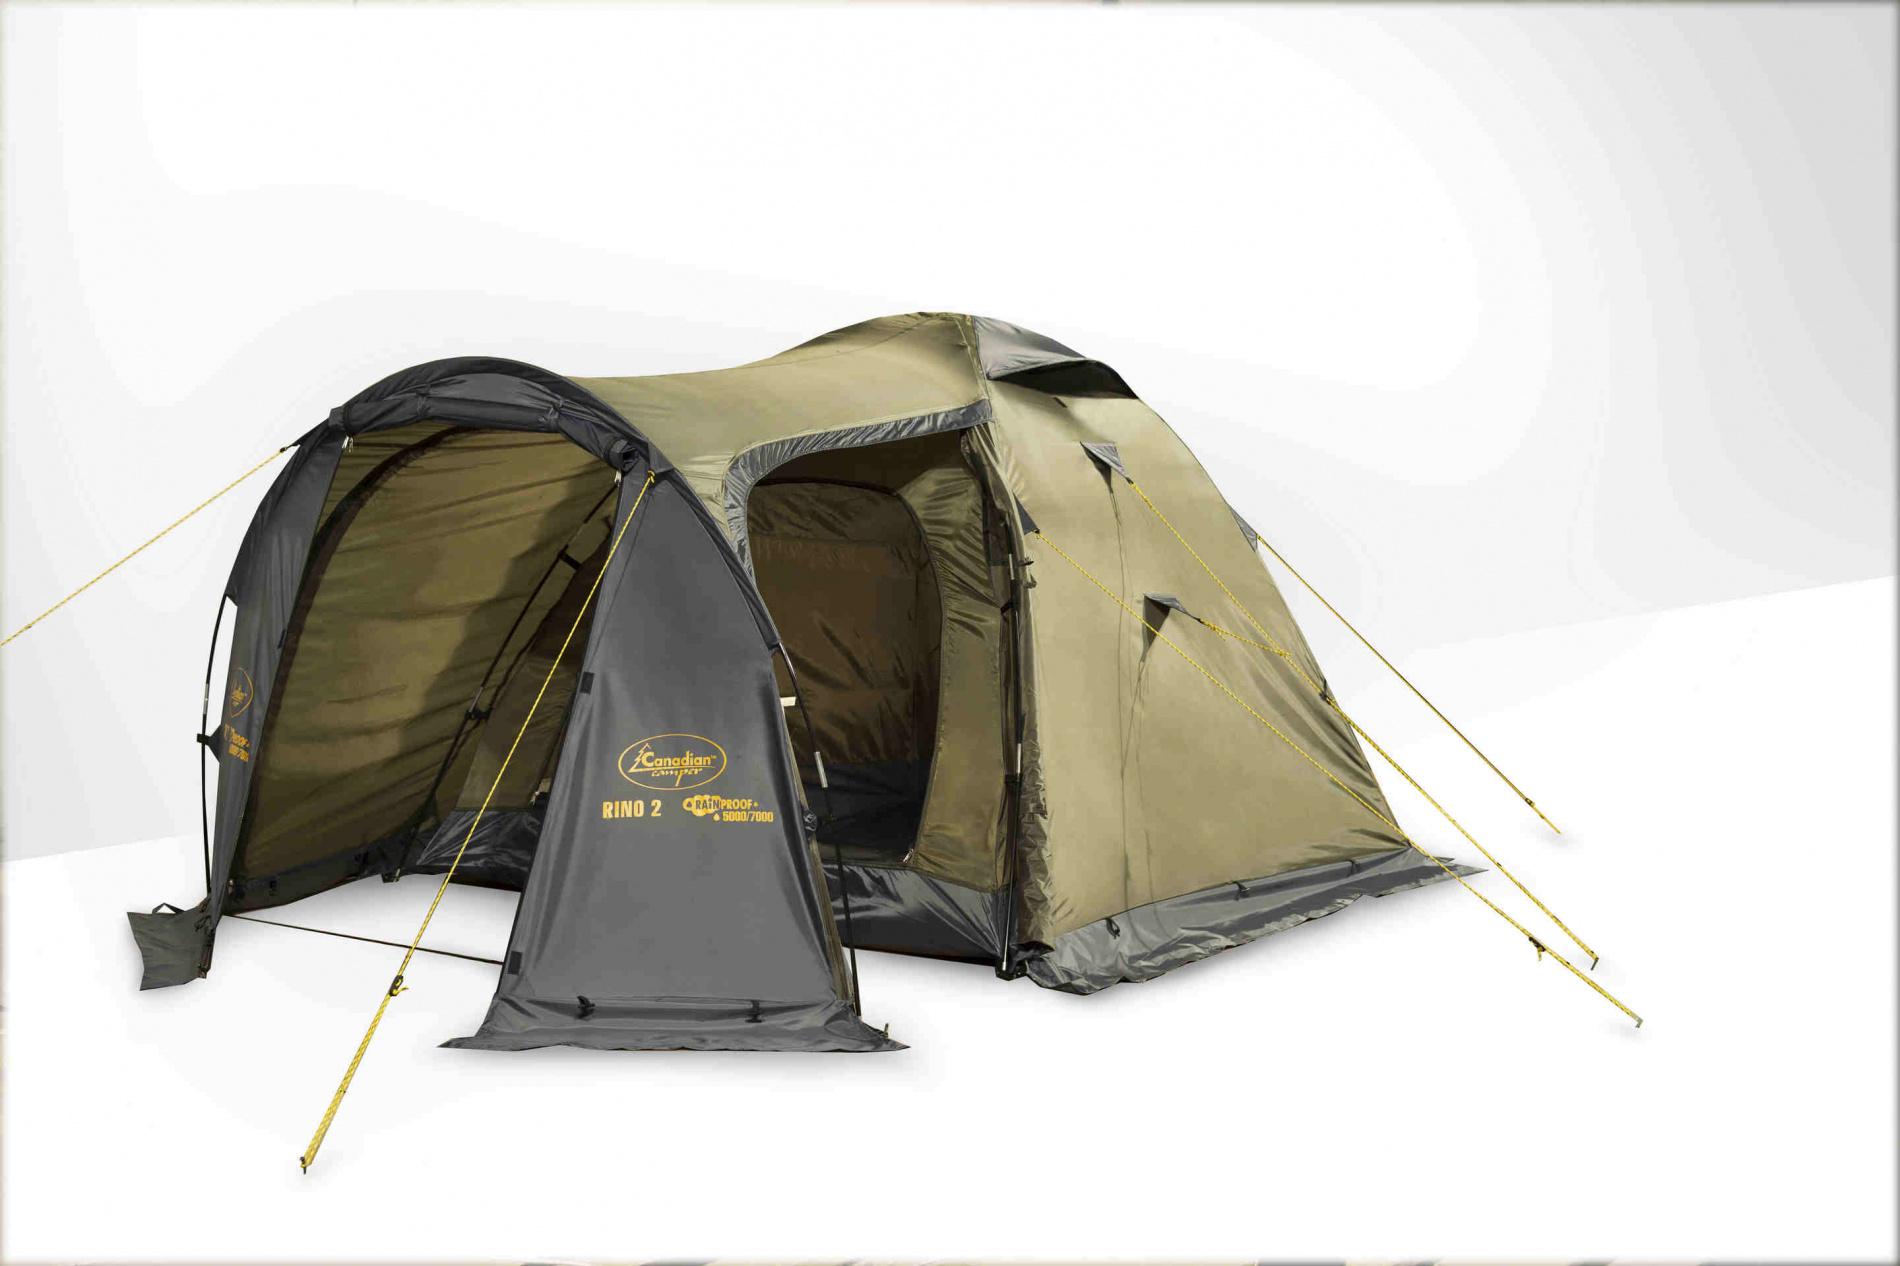 Палатка Canadian Camper RINO 3 (цвет forest дуги 9,5 мм)Палатки<br>Палатка RINO 3 (цвет forest дуги 9,5 мм)<br><br>Сезон: лето<br>Цвет: оливковый